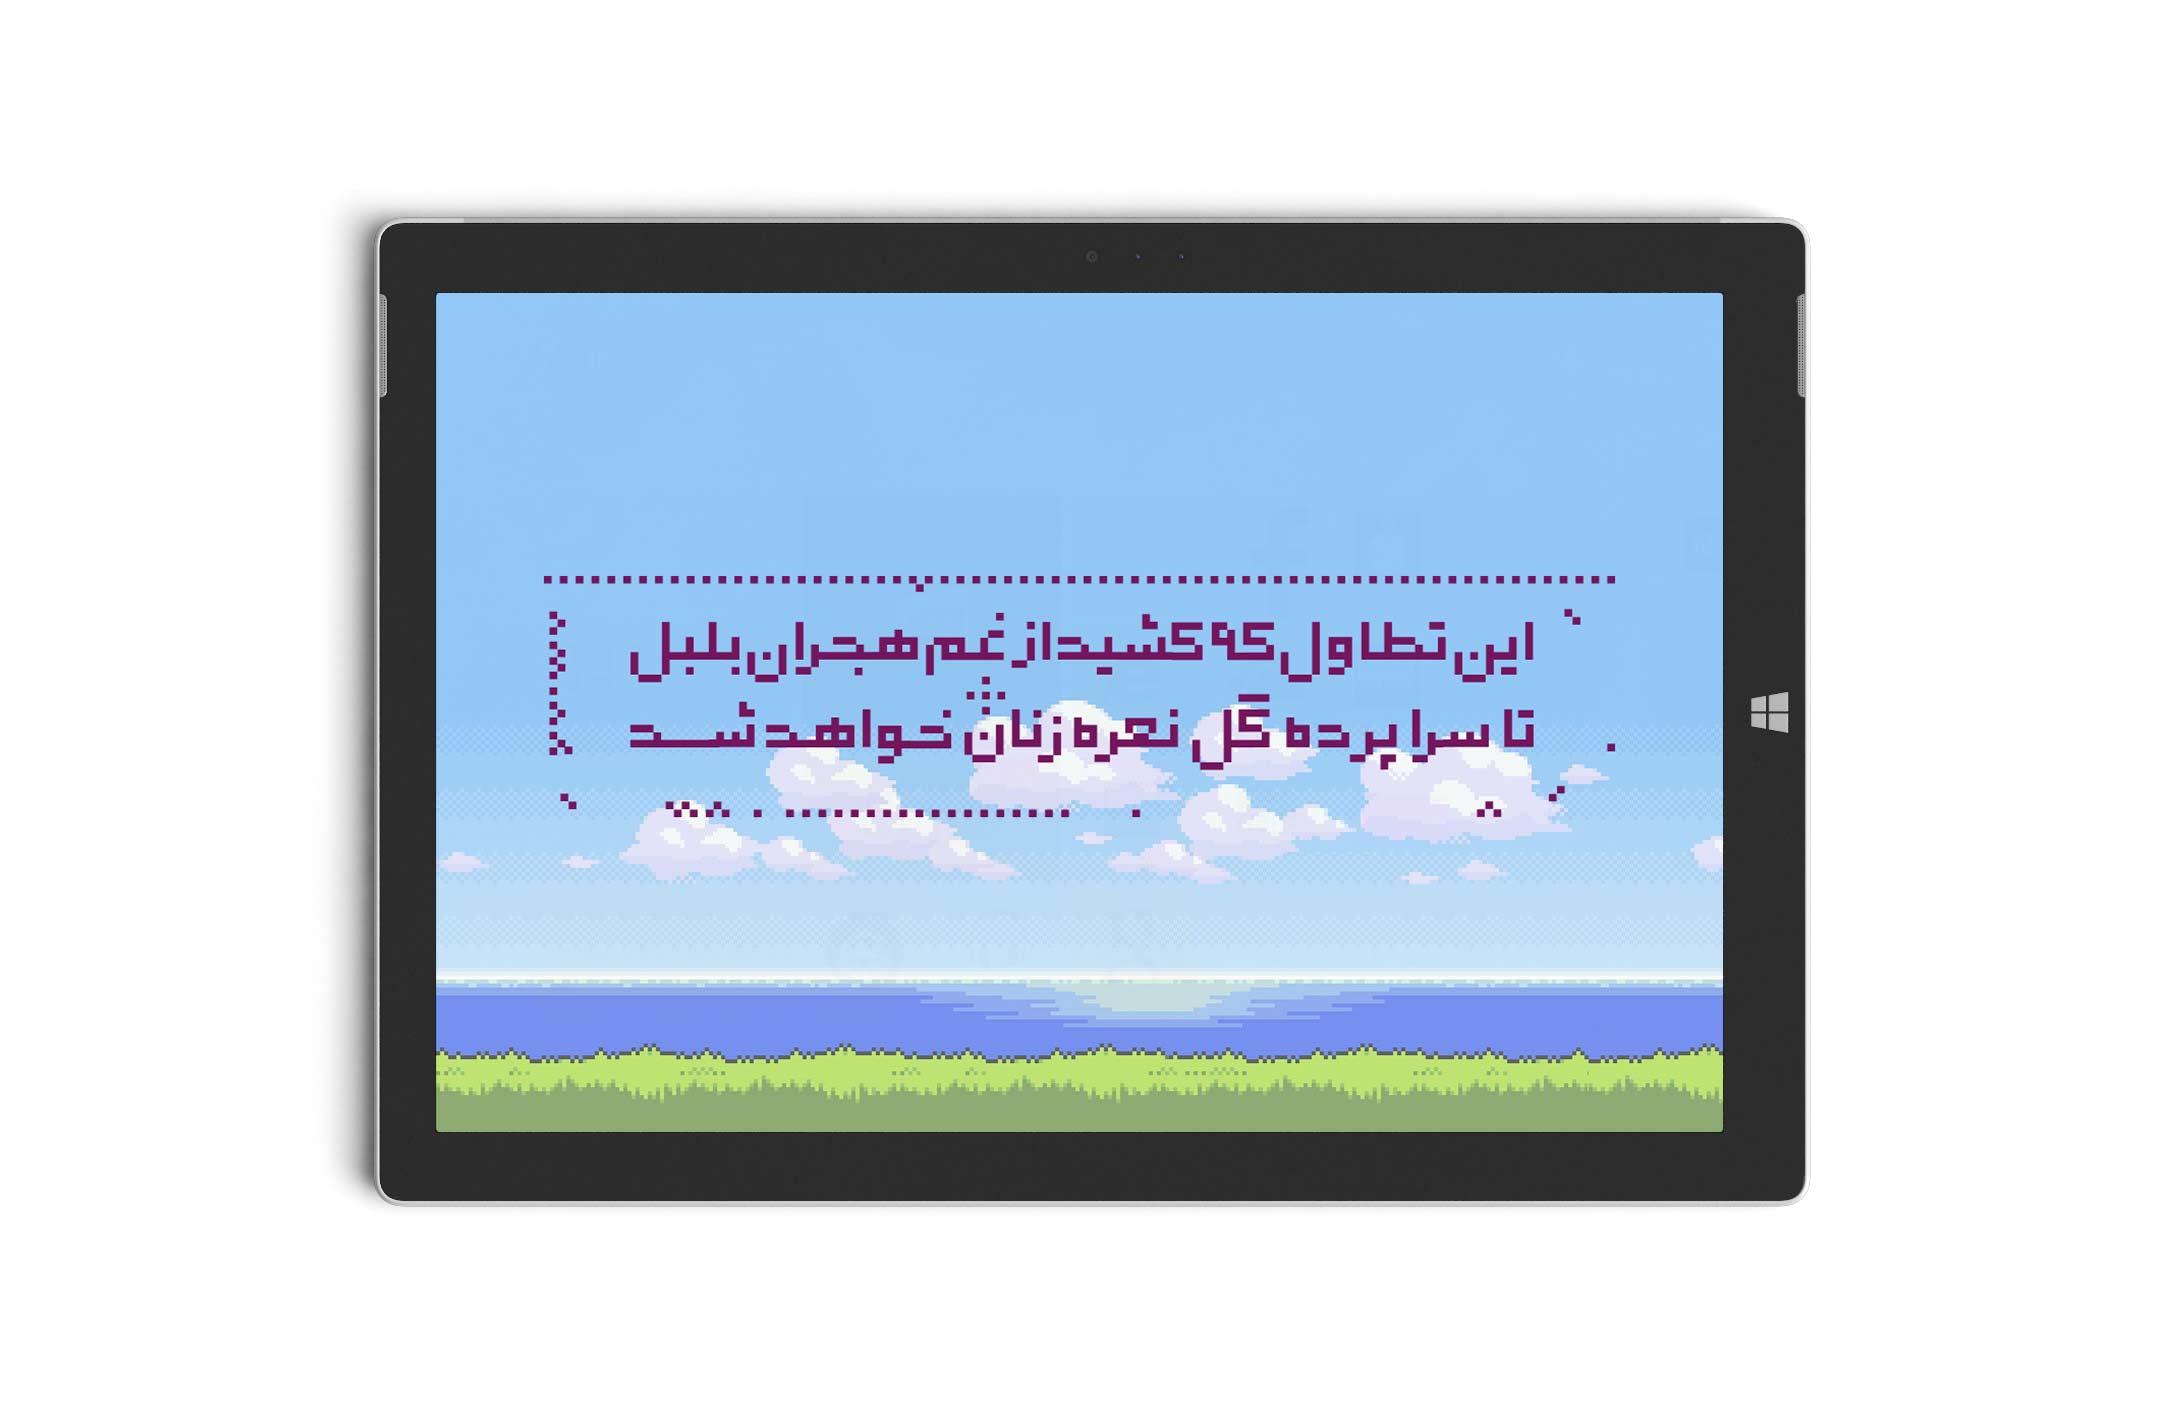 8bit-font-pixeler-2